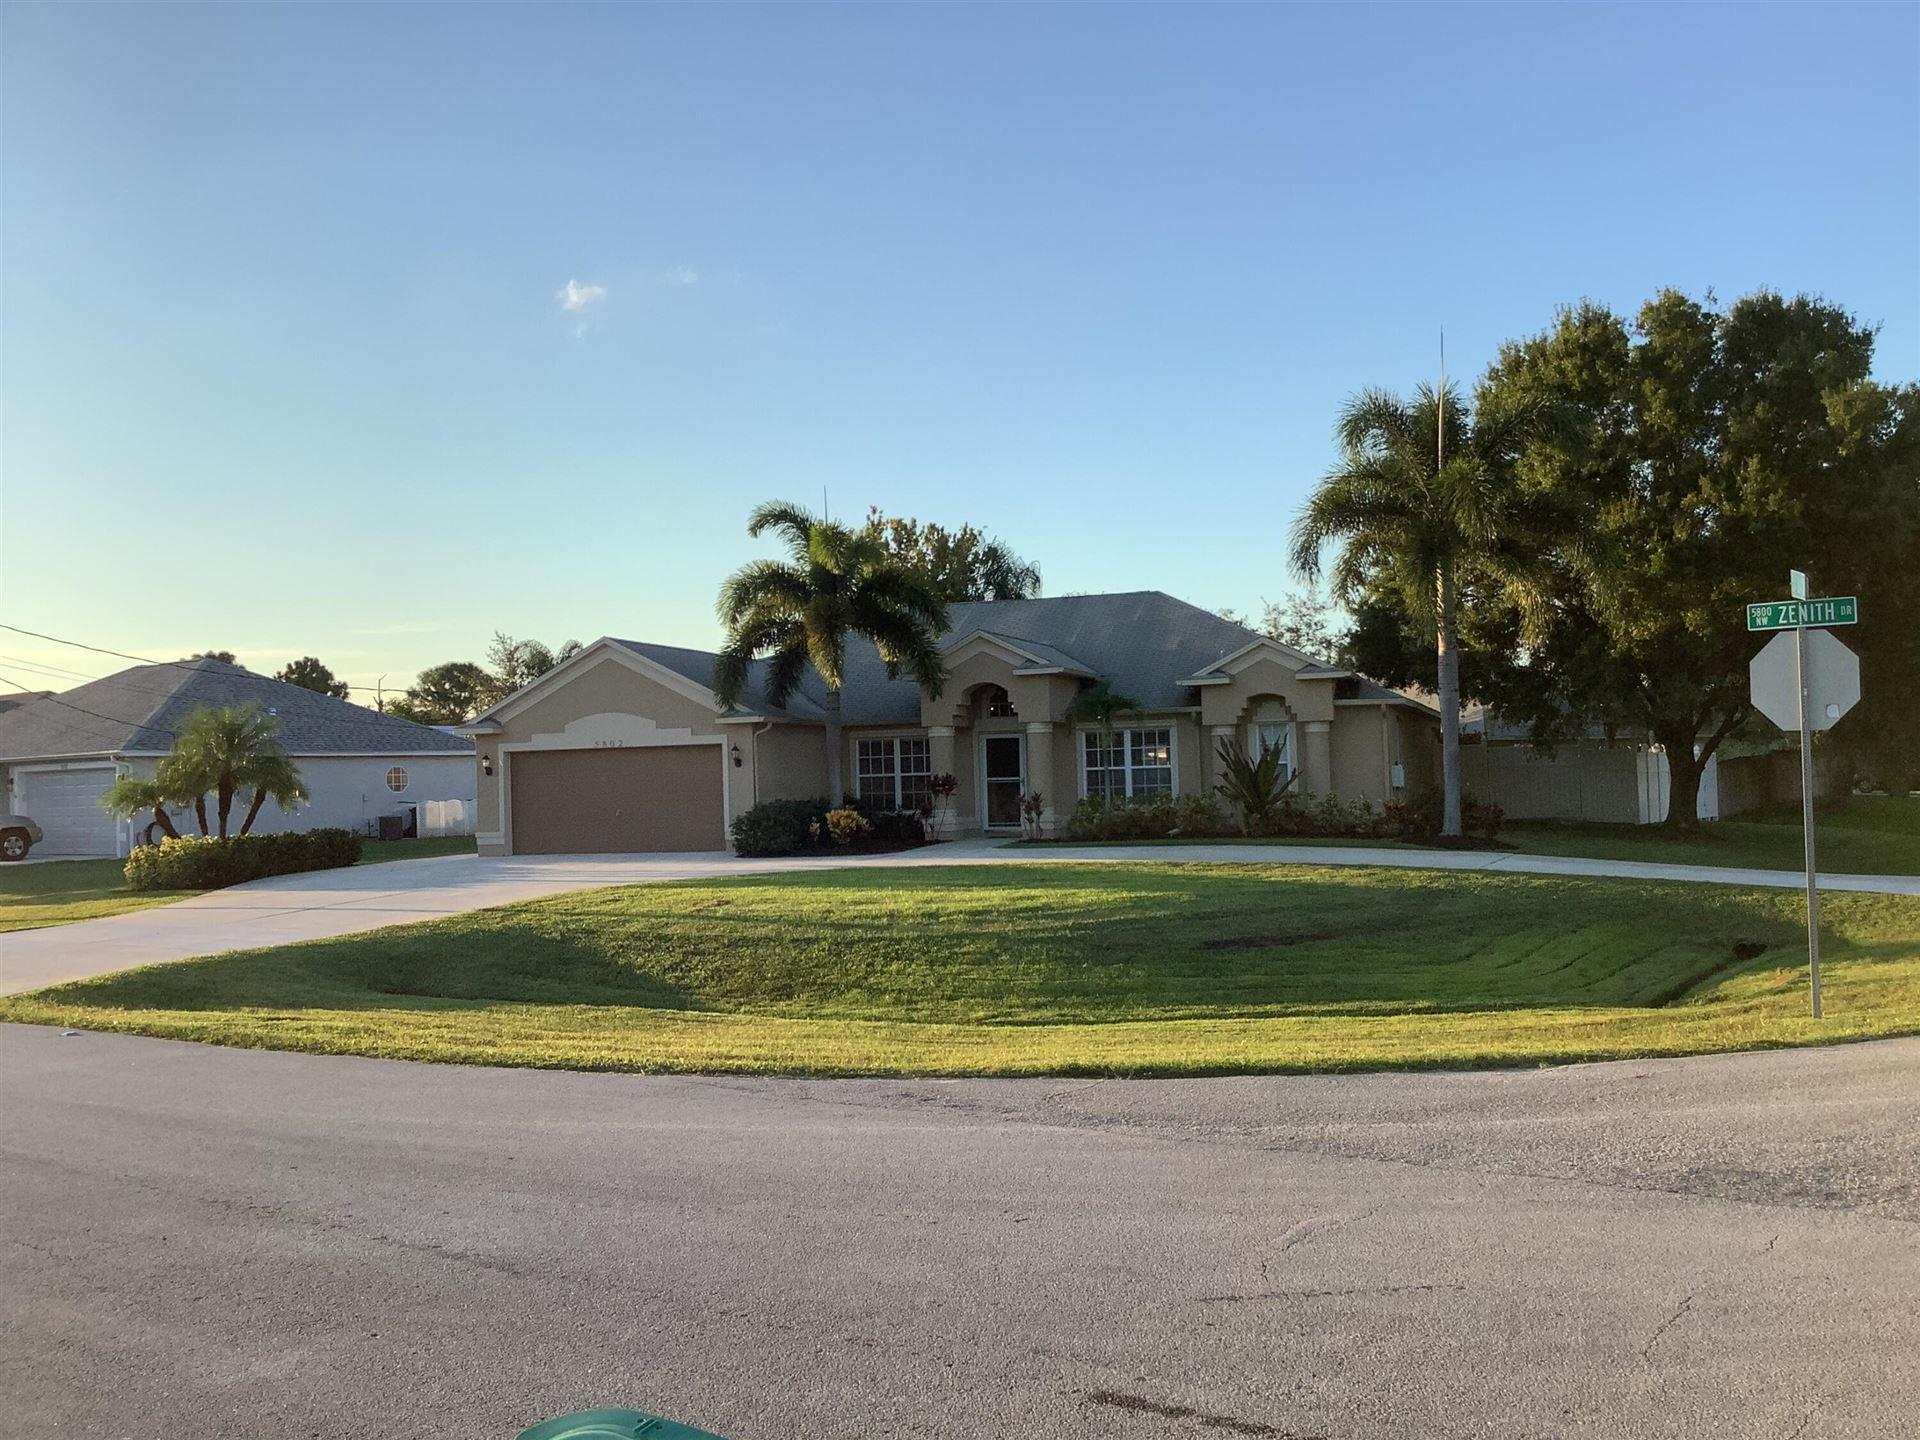 5802 NW Basswood Drive, Port Saint Lucie, FL 34986 - MLS#: RX-10749188